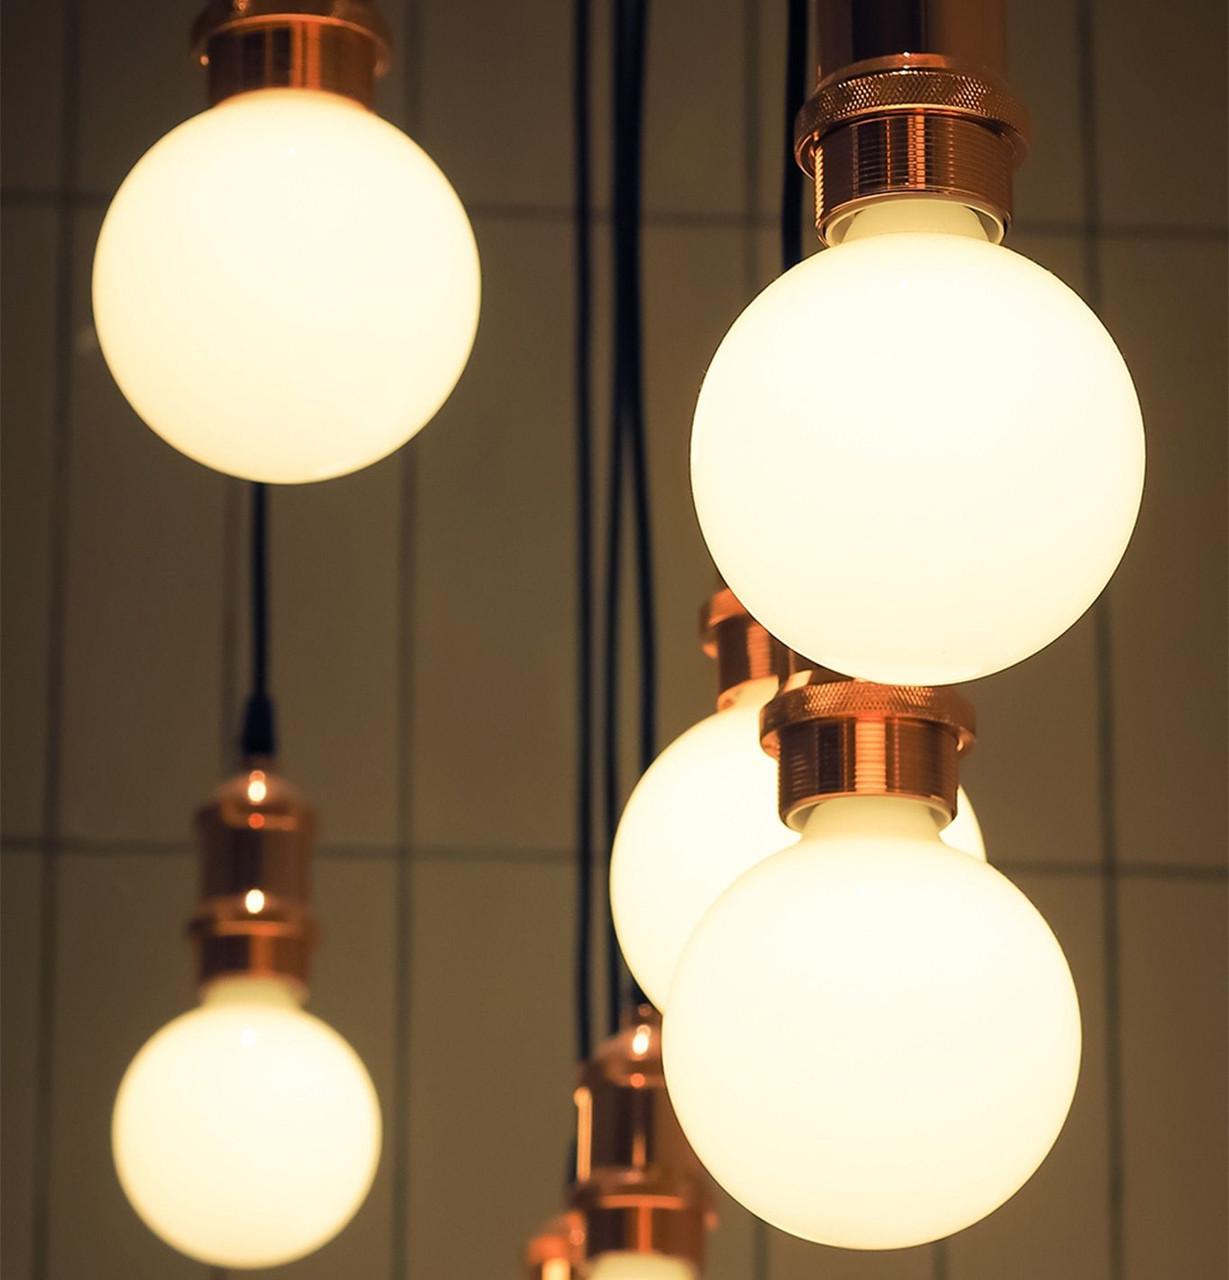 LED Dimmable G95 BC Light Bulbs